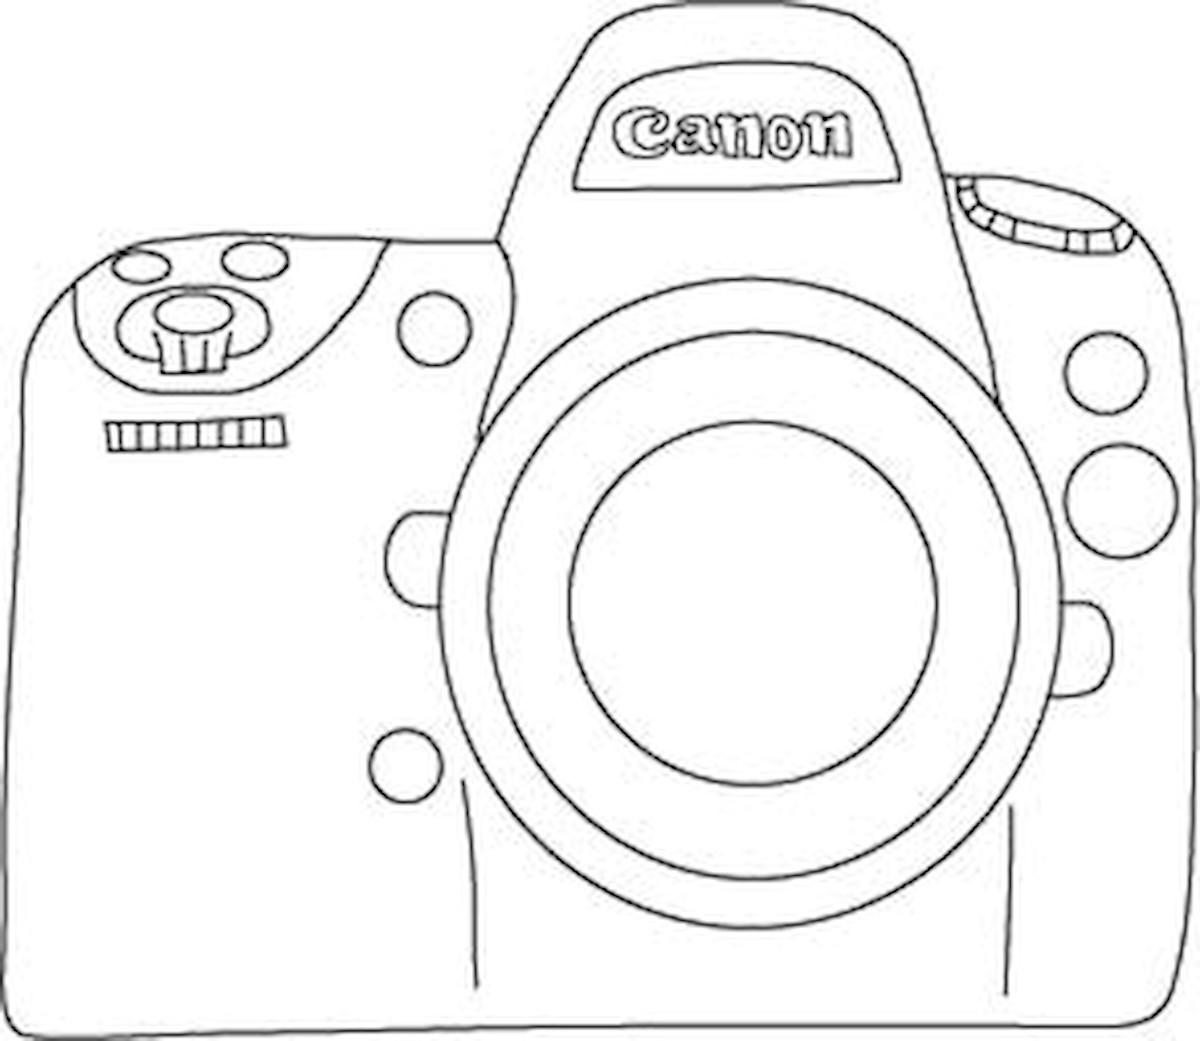 Easy Camera Drawing